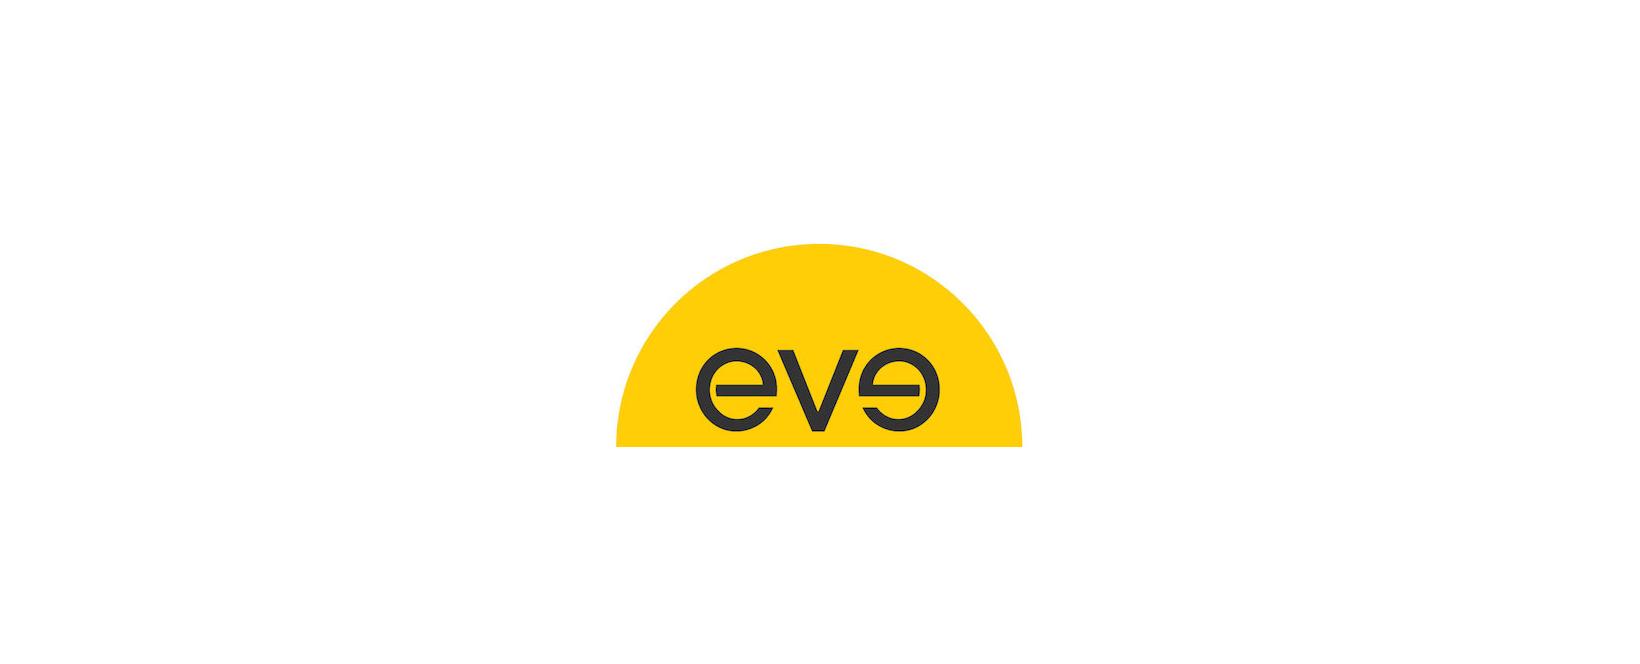 Eve Sleep UK Discount Code 2021